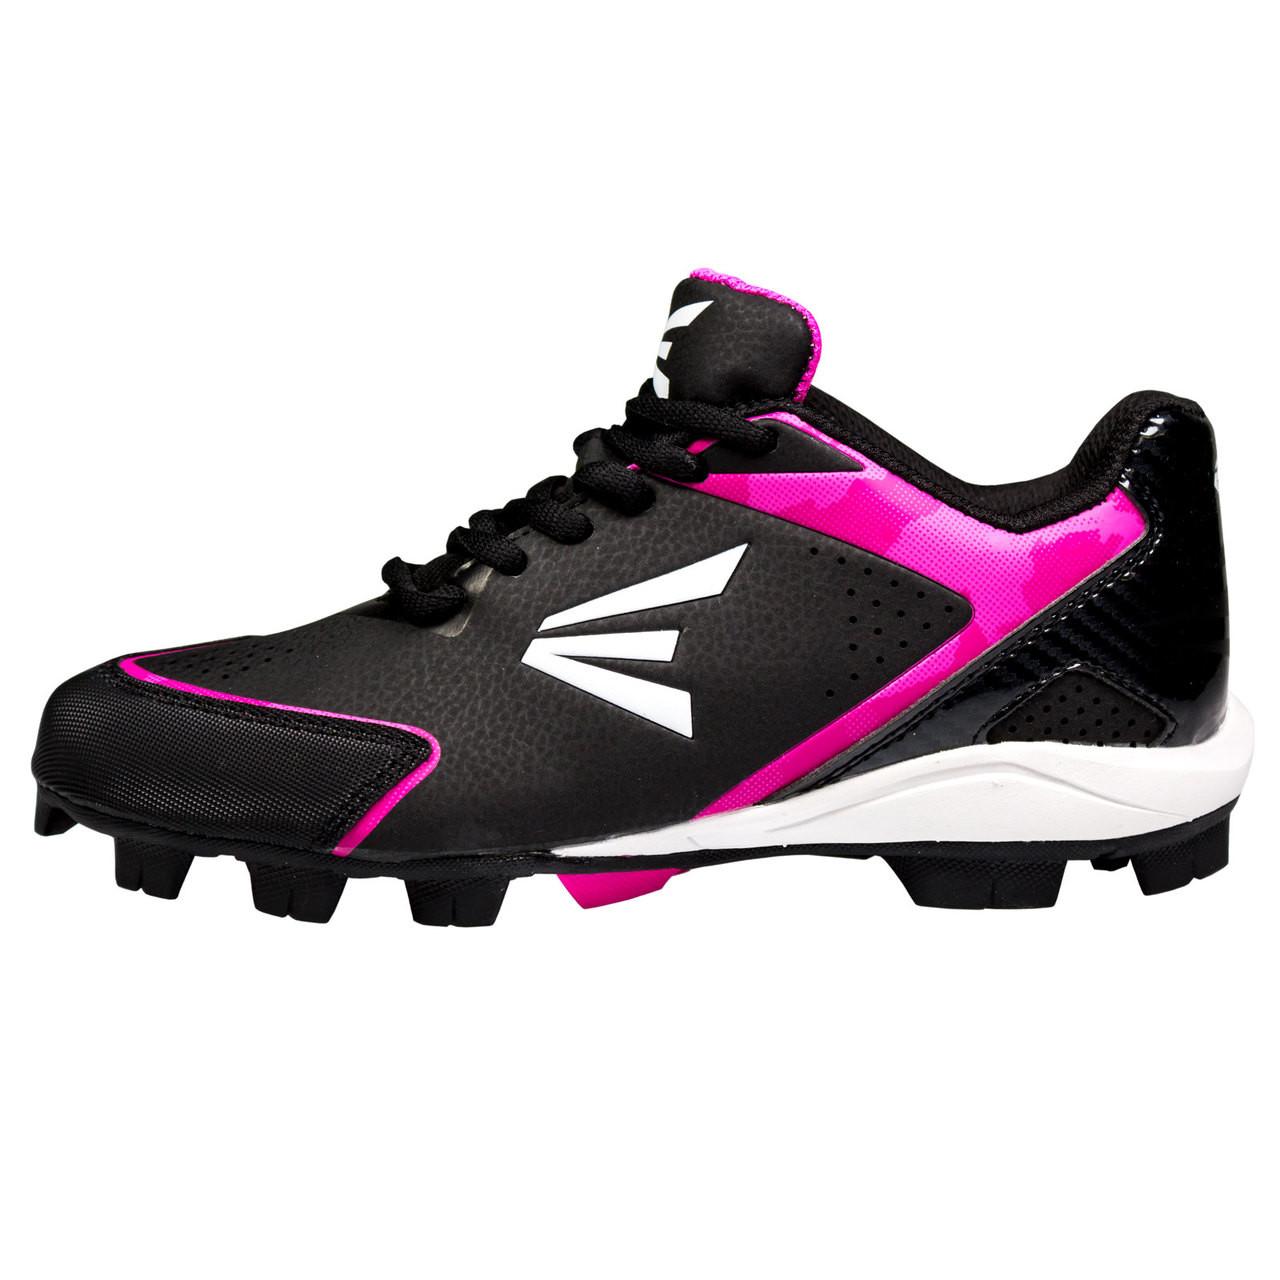 Easton 360 Instinct Low Womens Baseball Cleats - Black a47da07ca